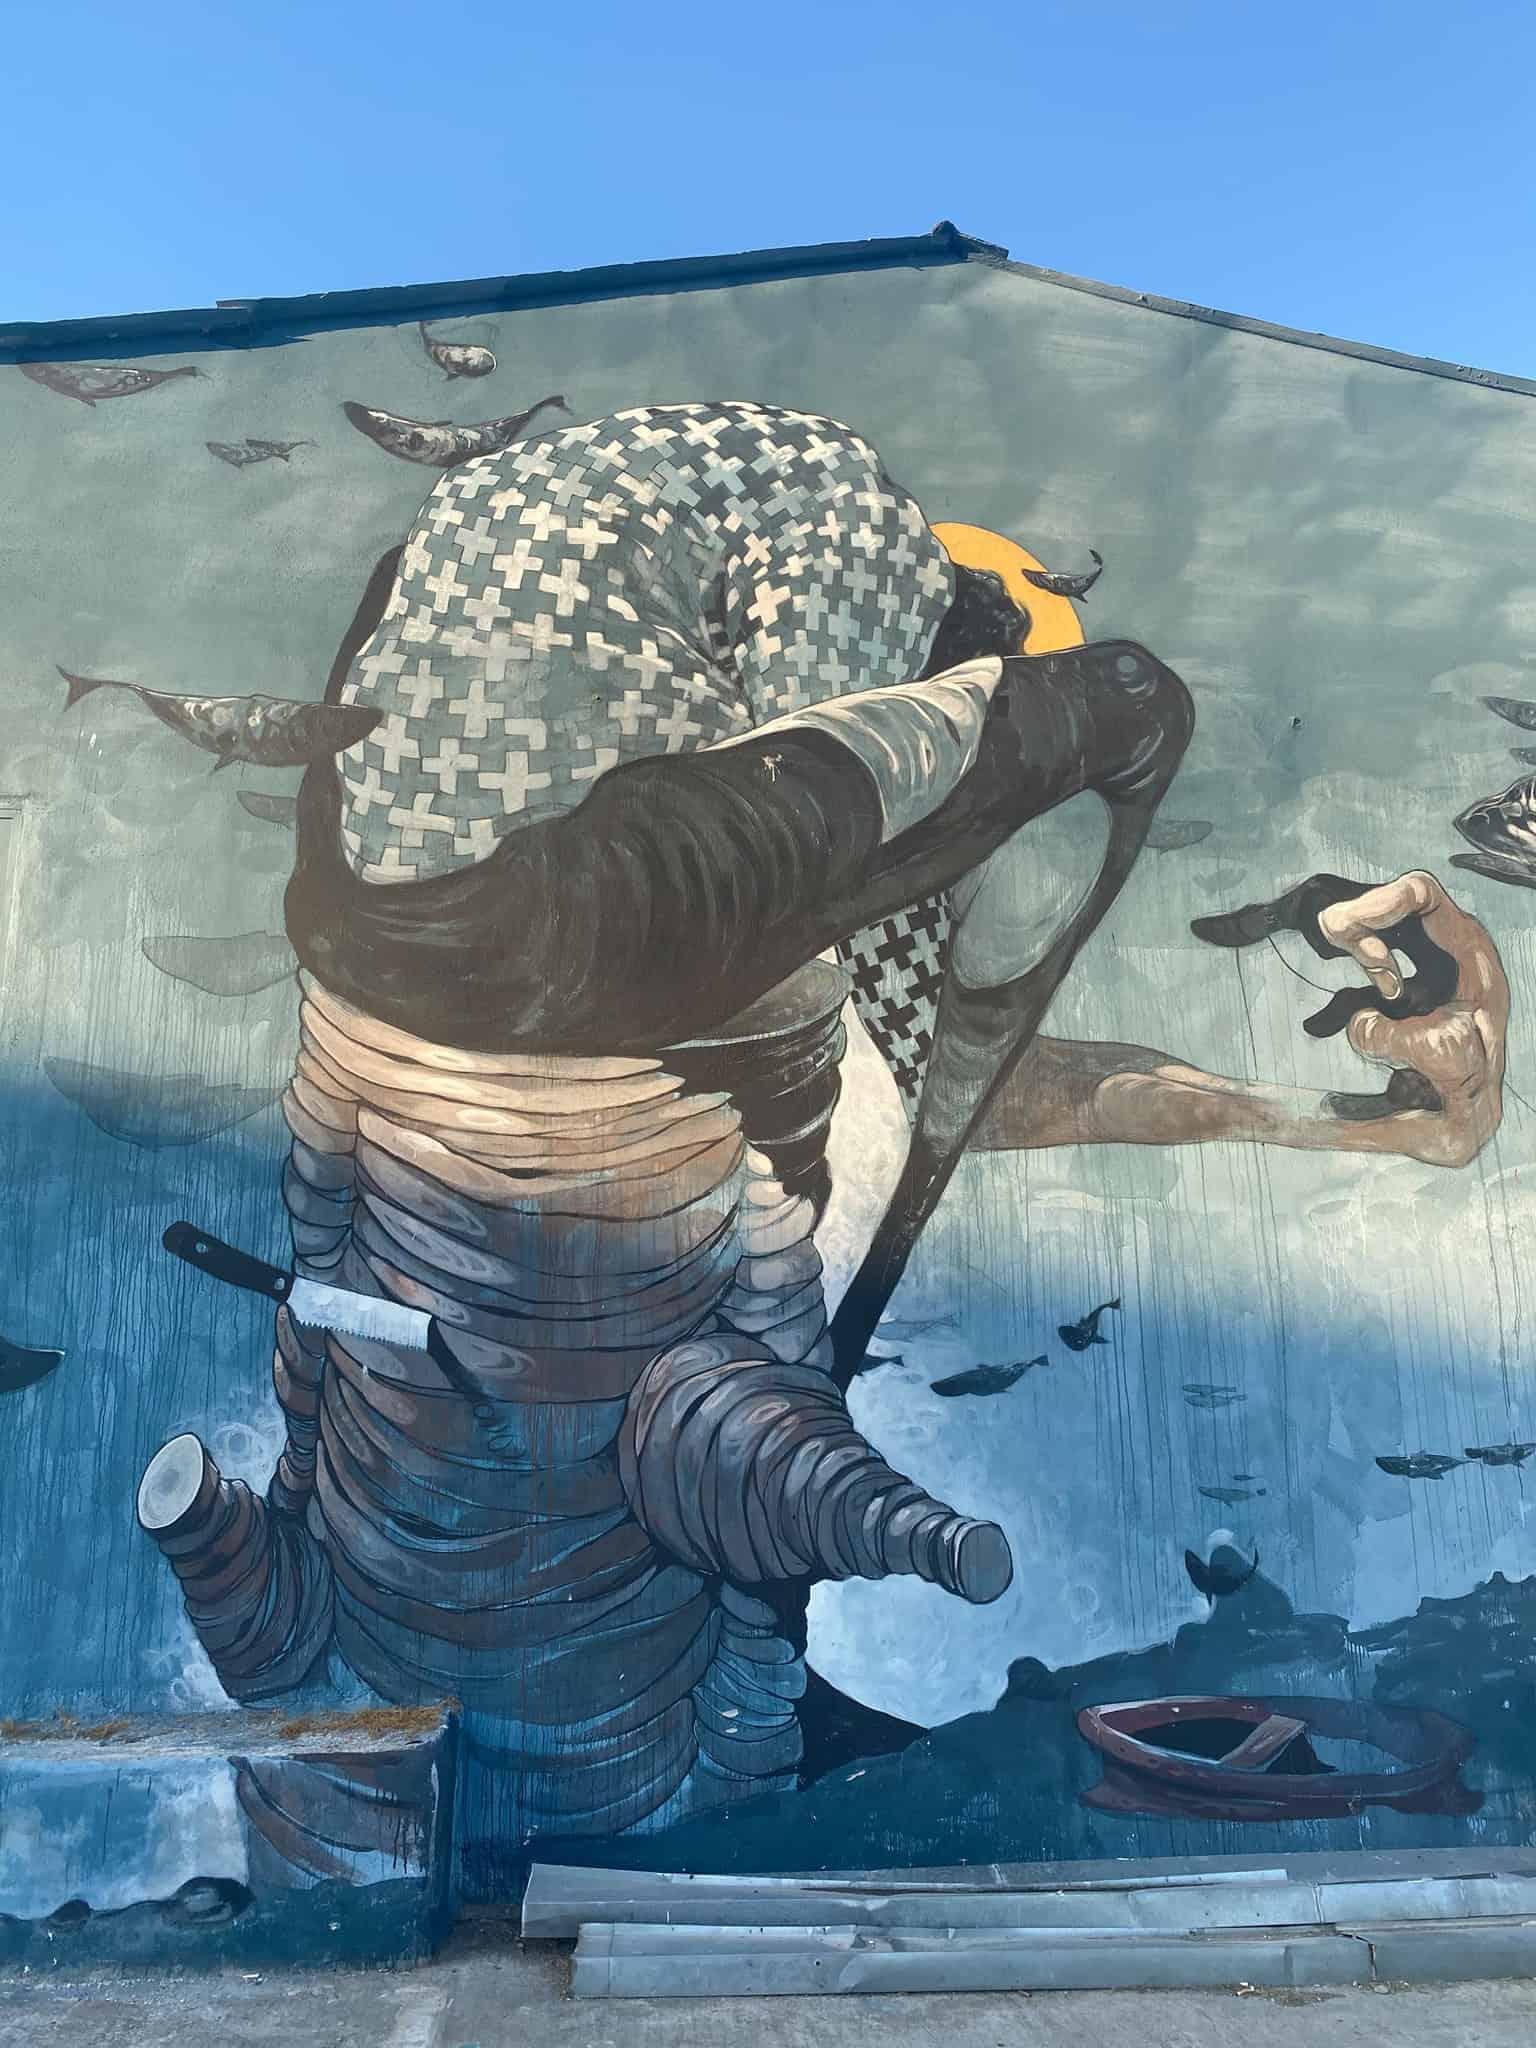 Street art close to the port area